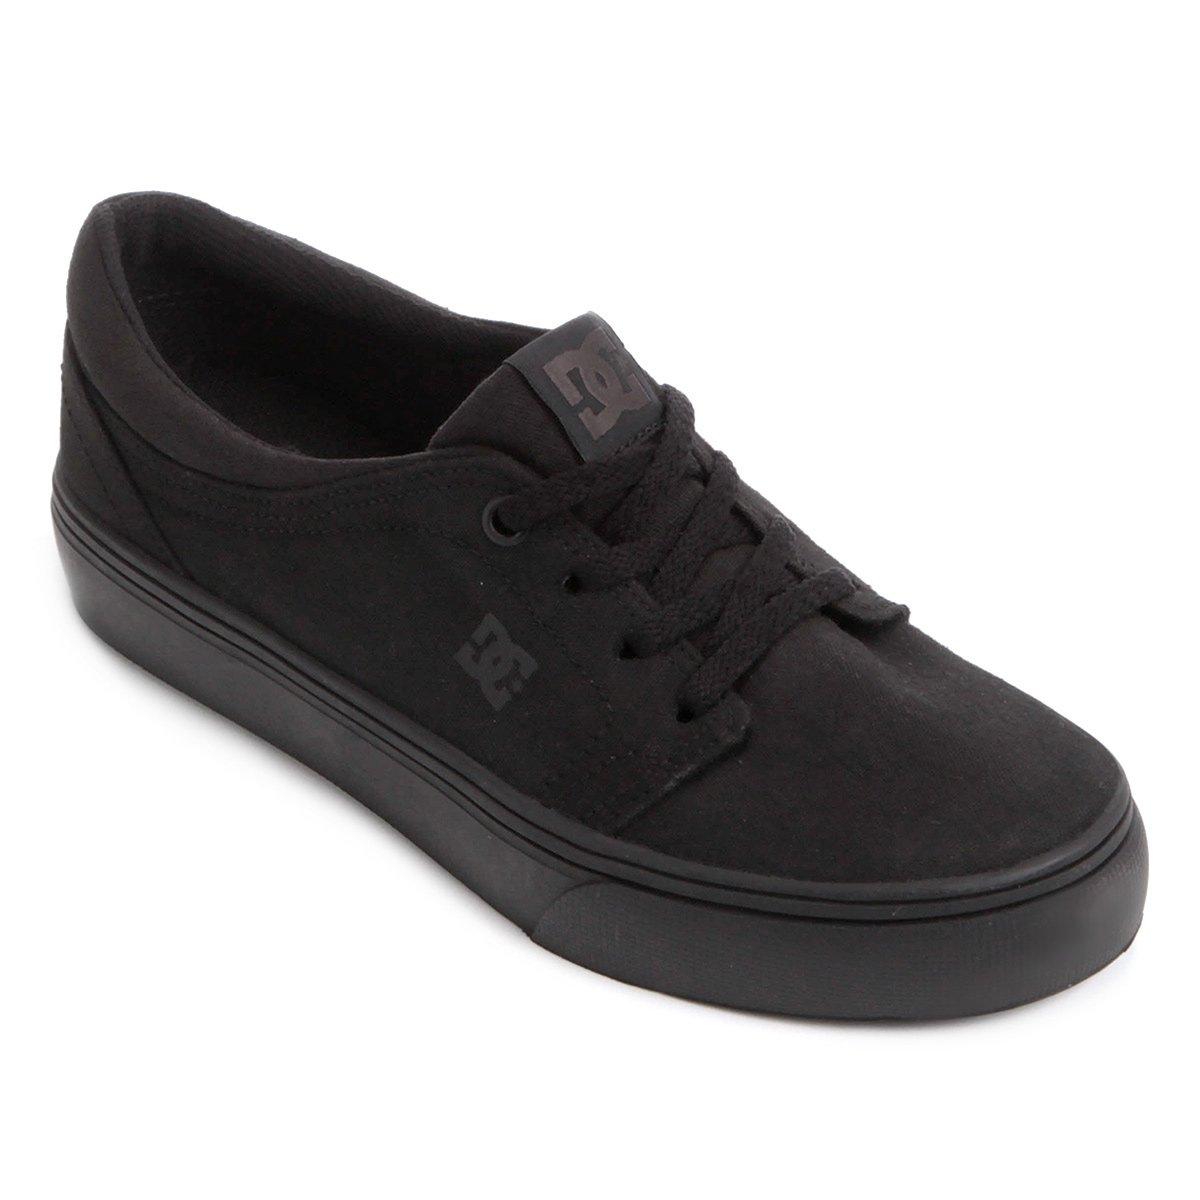 9c532161c8 Tênis DC Shoes Trase Tx Feminino | Zattini